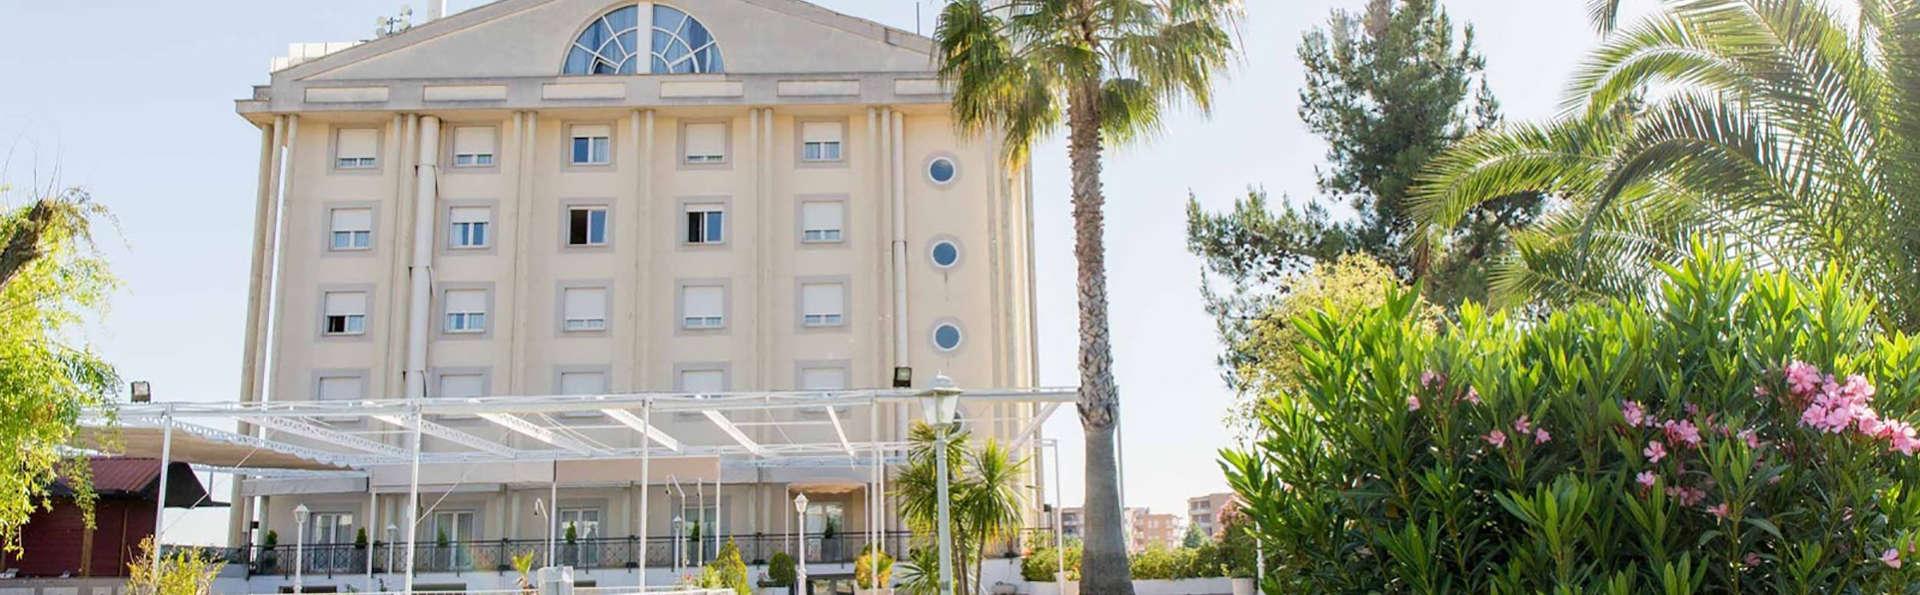 Hotel Velada Mérida - Edit_Front2.jpg